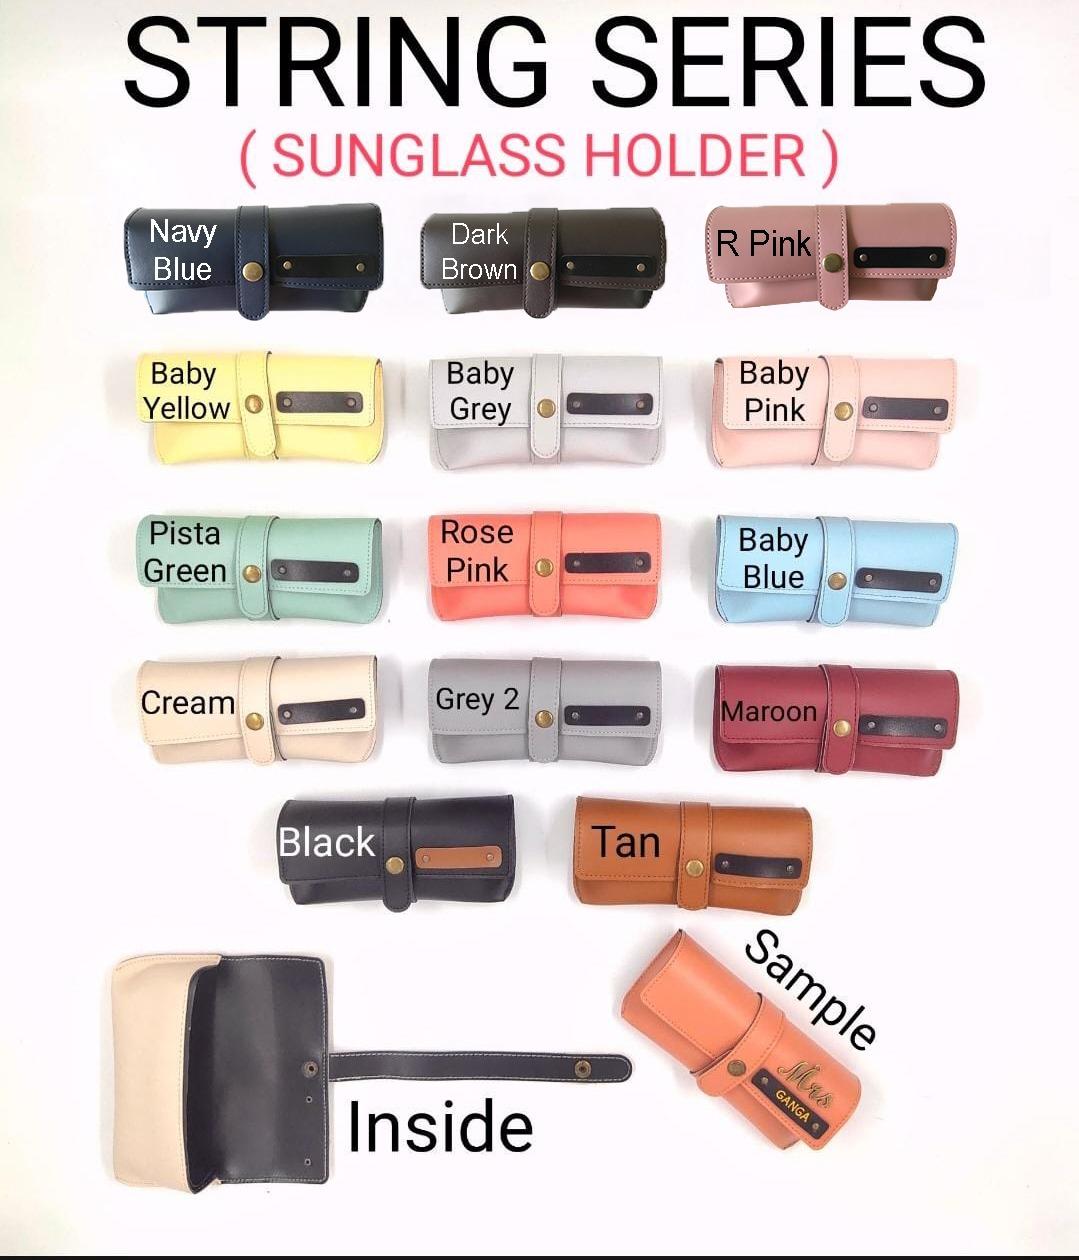 String Series Sunglass Holder